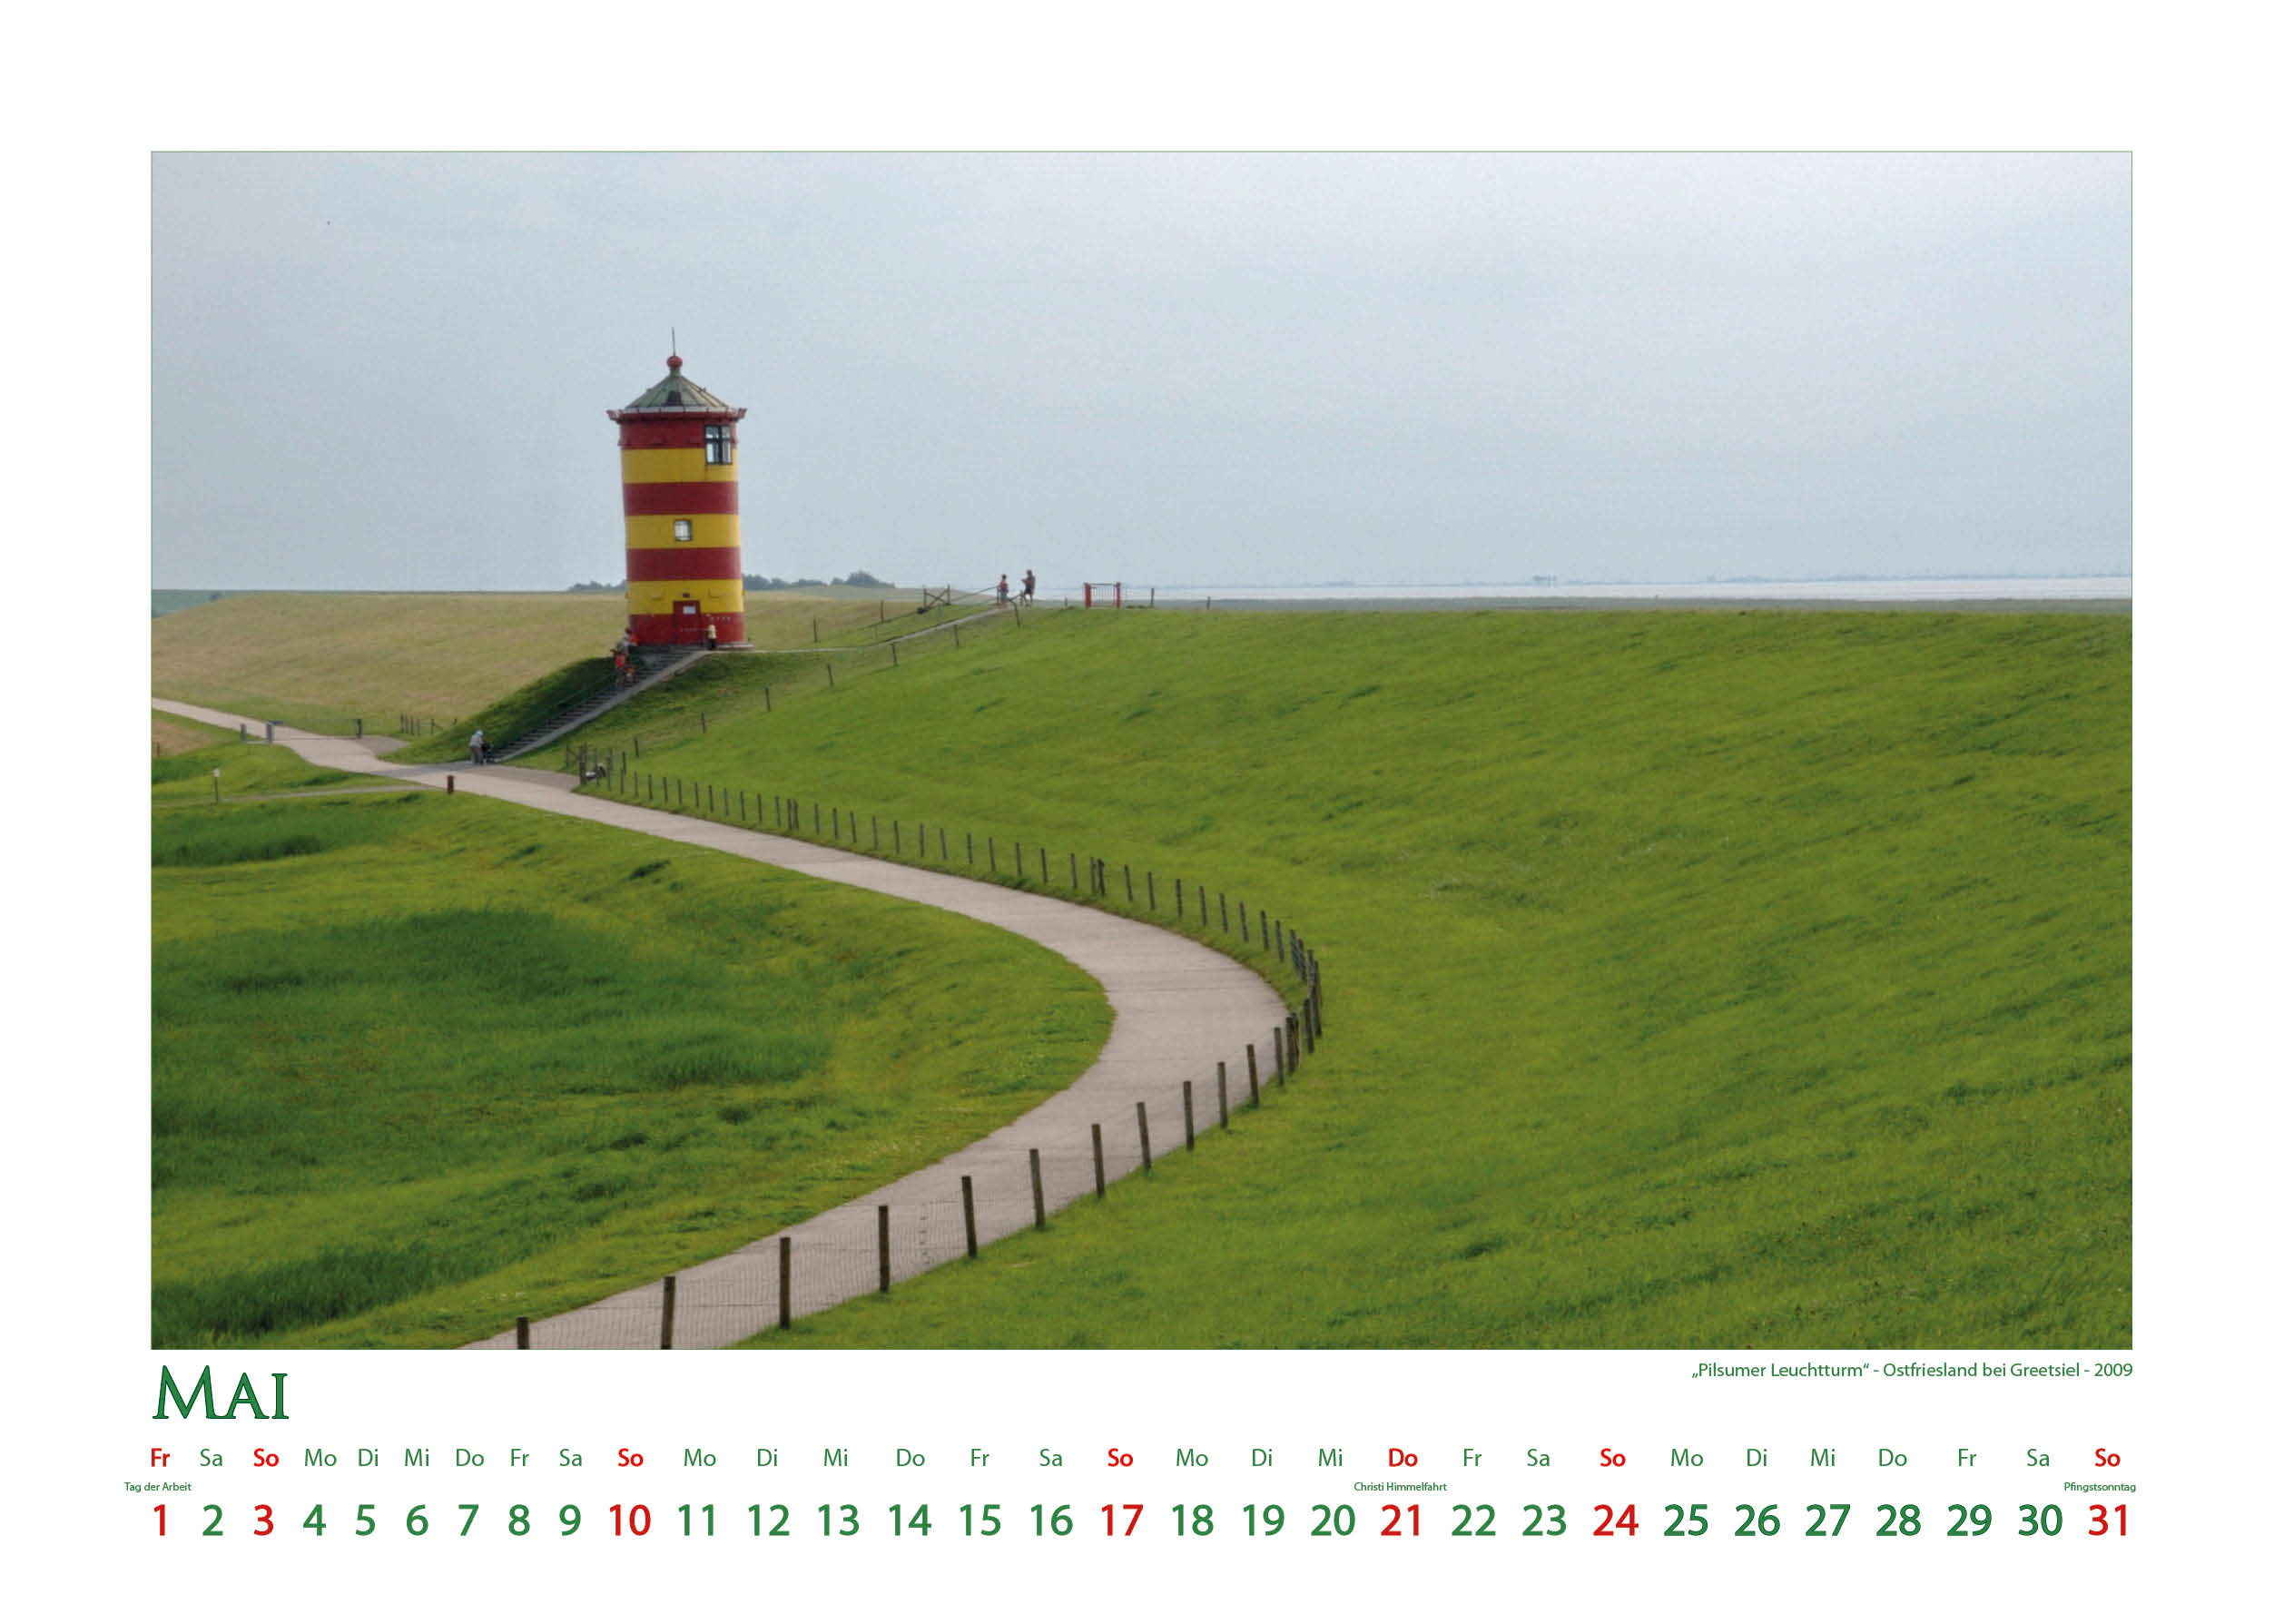 Pilsumer Leuchtturm - Leuchttürme - Kalender 2020 © Katharina Hansen-Gluschitz